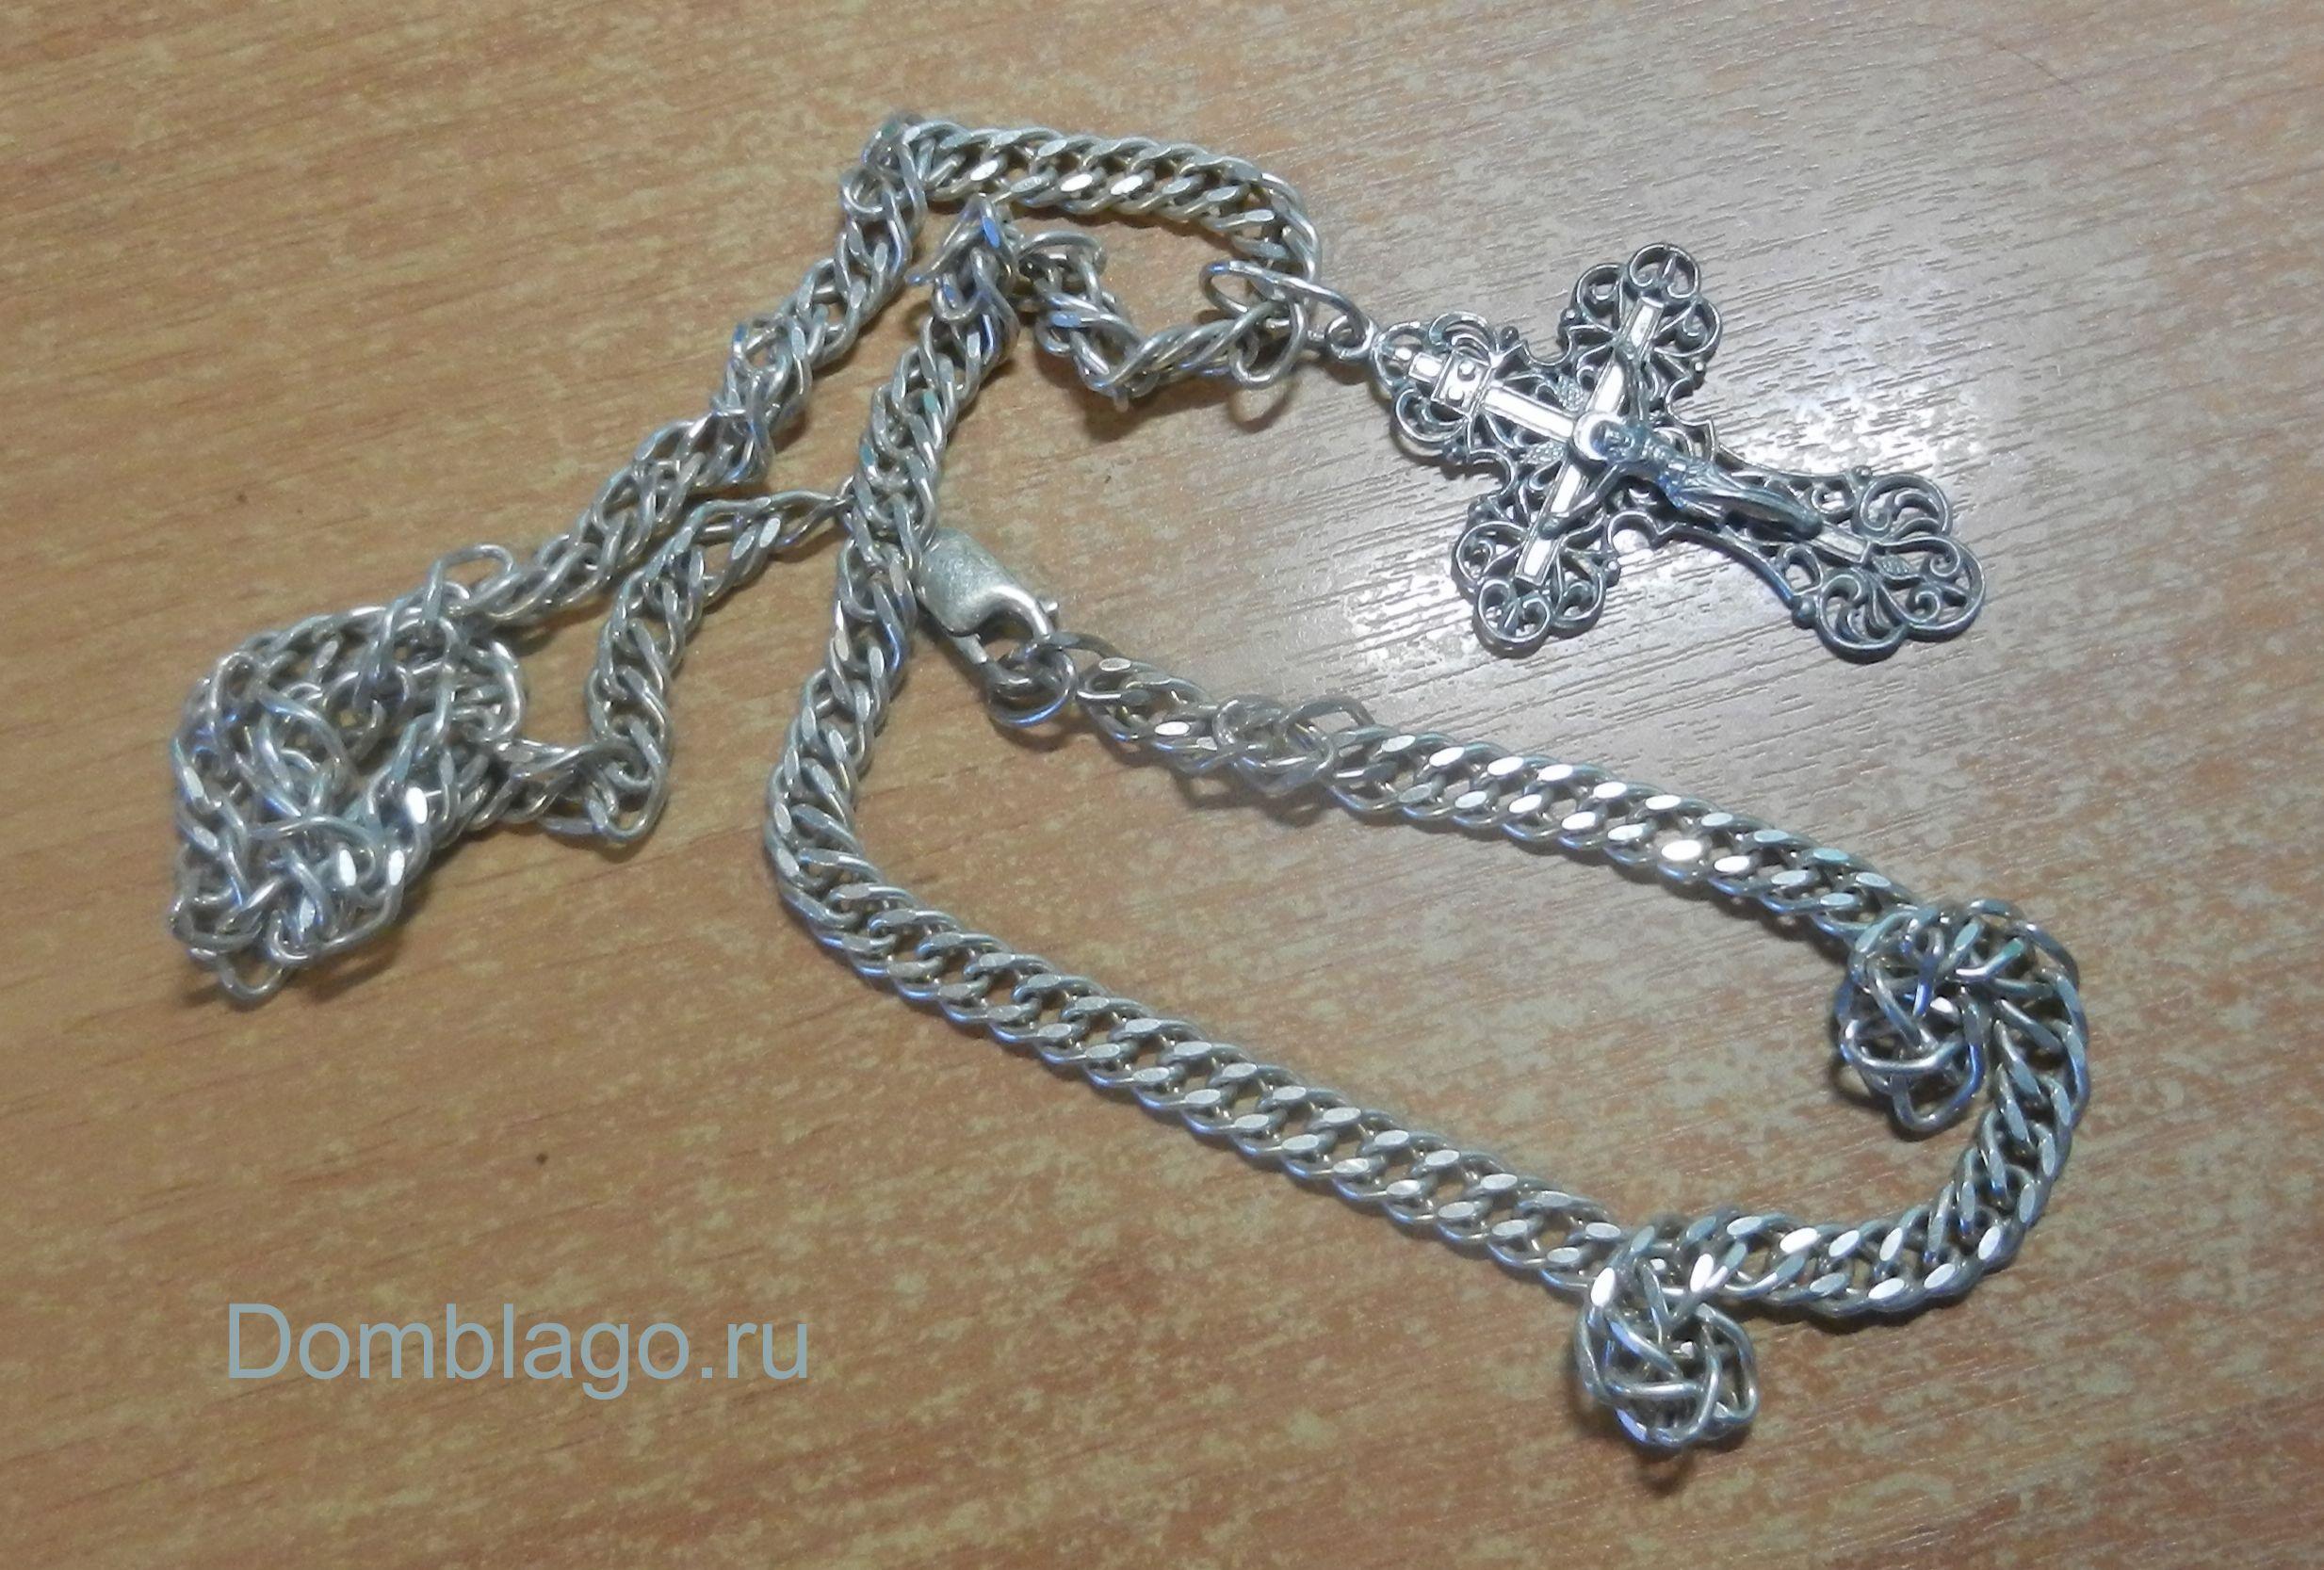 Очистить серебряную цепочку в домашних условиях